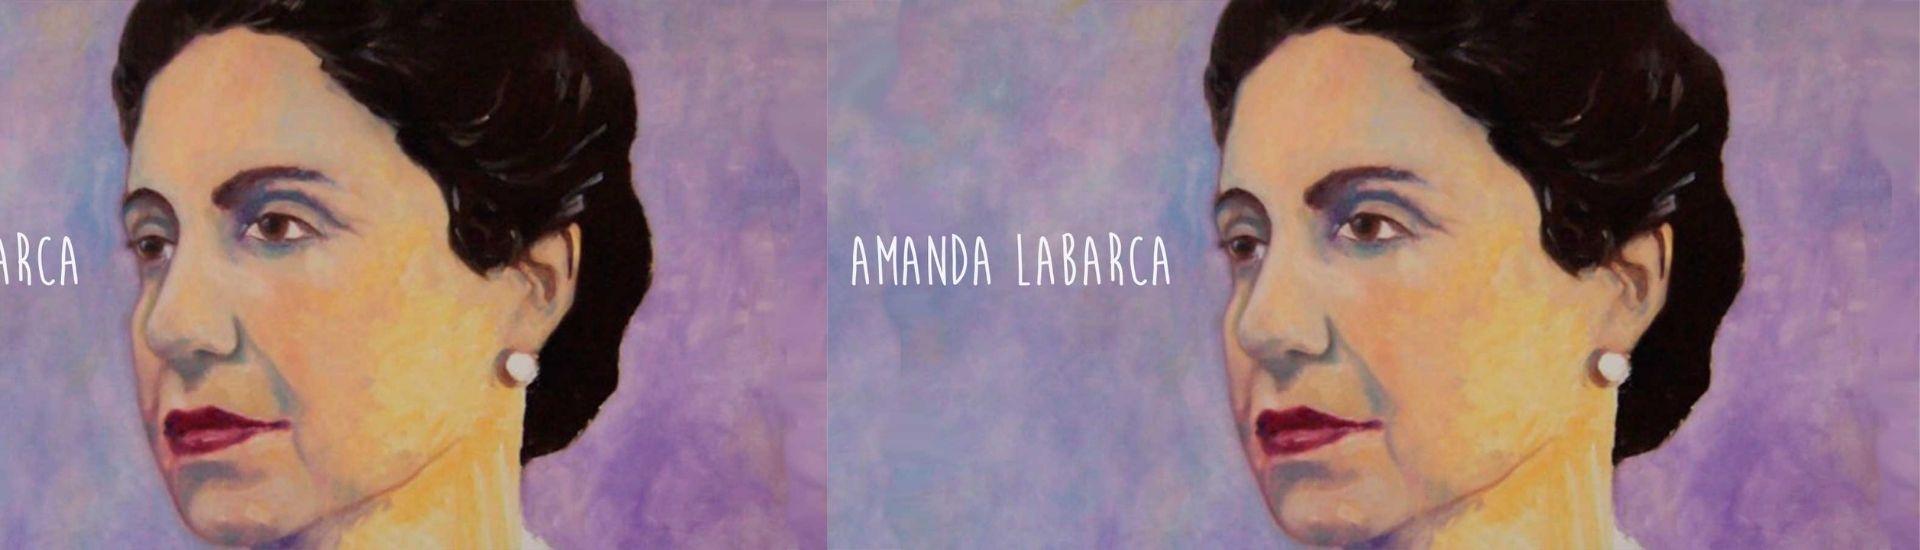 Amanda Labarca